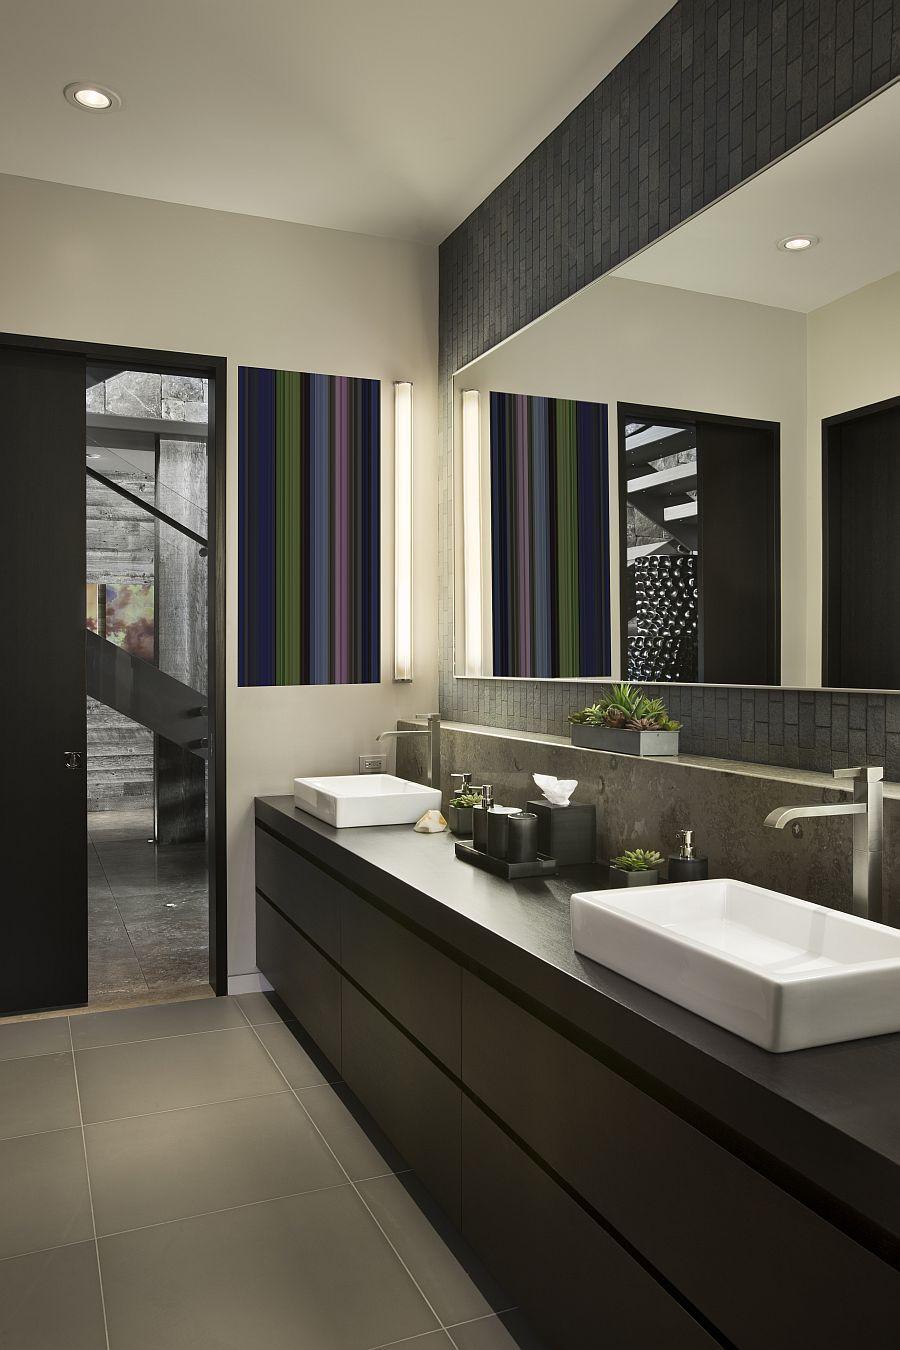 Contemporary Bathroom Design  Guest Bathroom Ideas with Pleasant Atmosphere Traba Homes